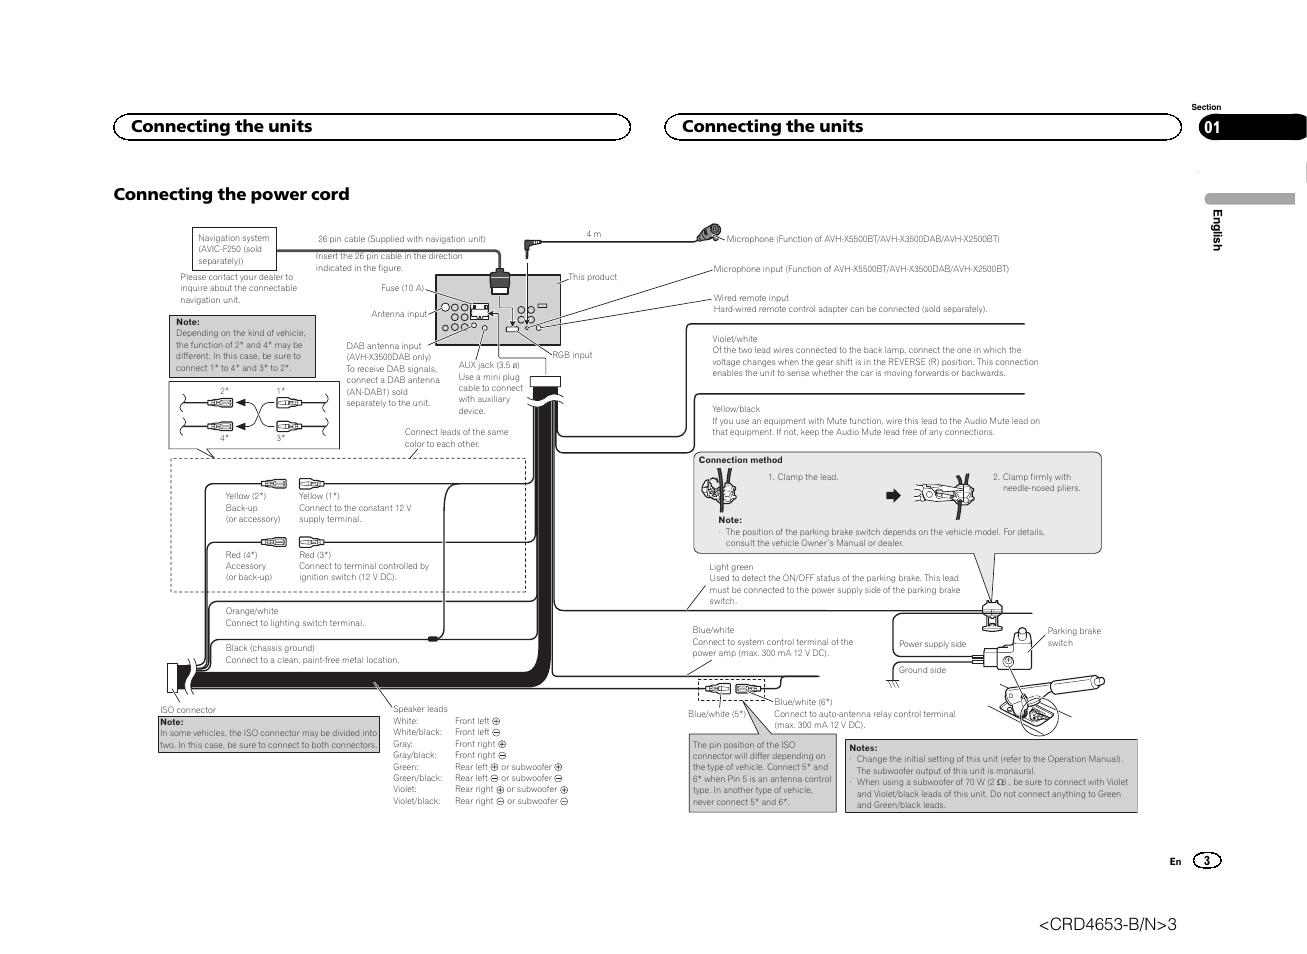 Avh X1500 Dvd Wiring Data Schematic Diagram Wiring Diagram Pioneer Avh 1500 Dvd